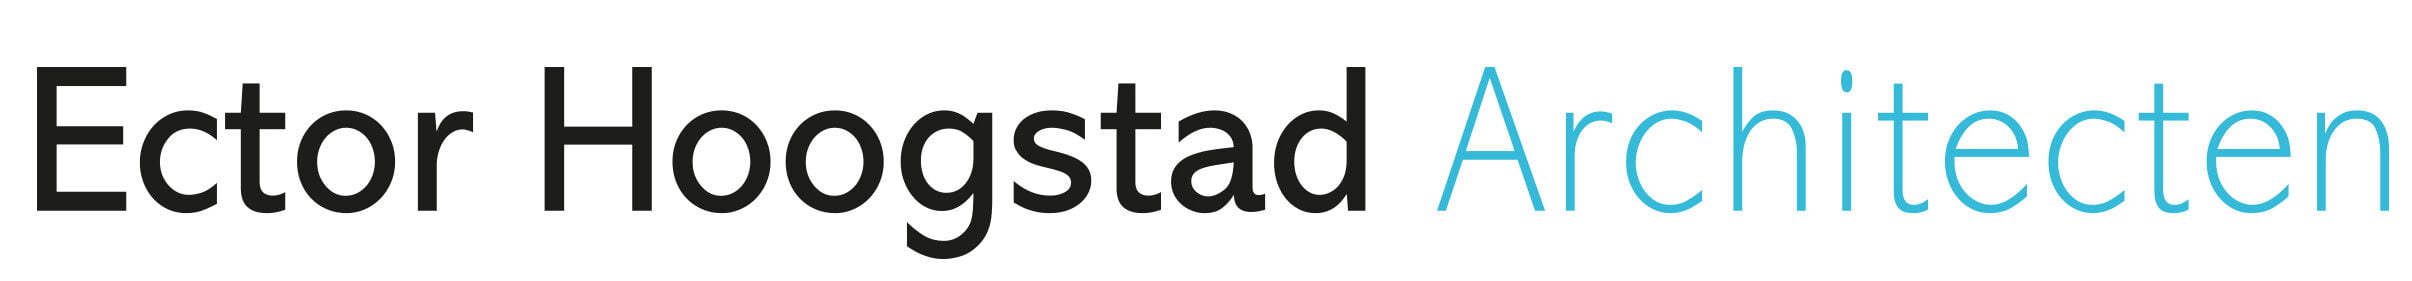 ector hoogstad architecten - Rotterdam